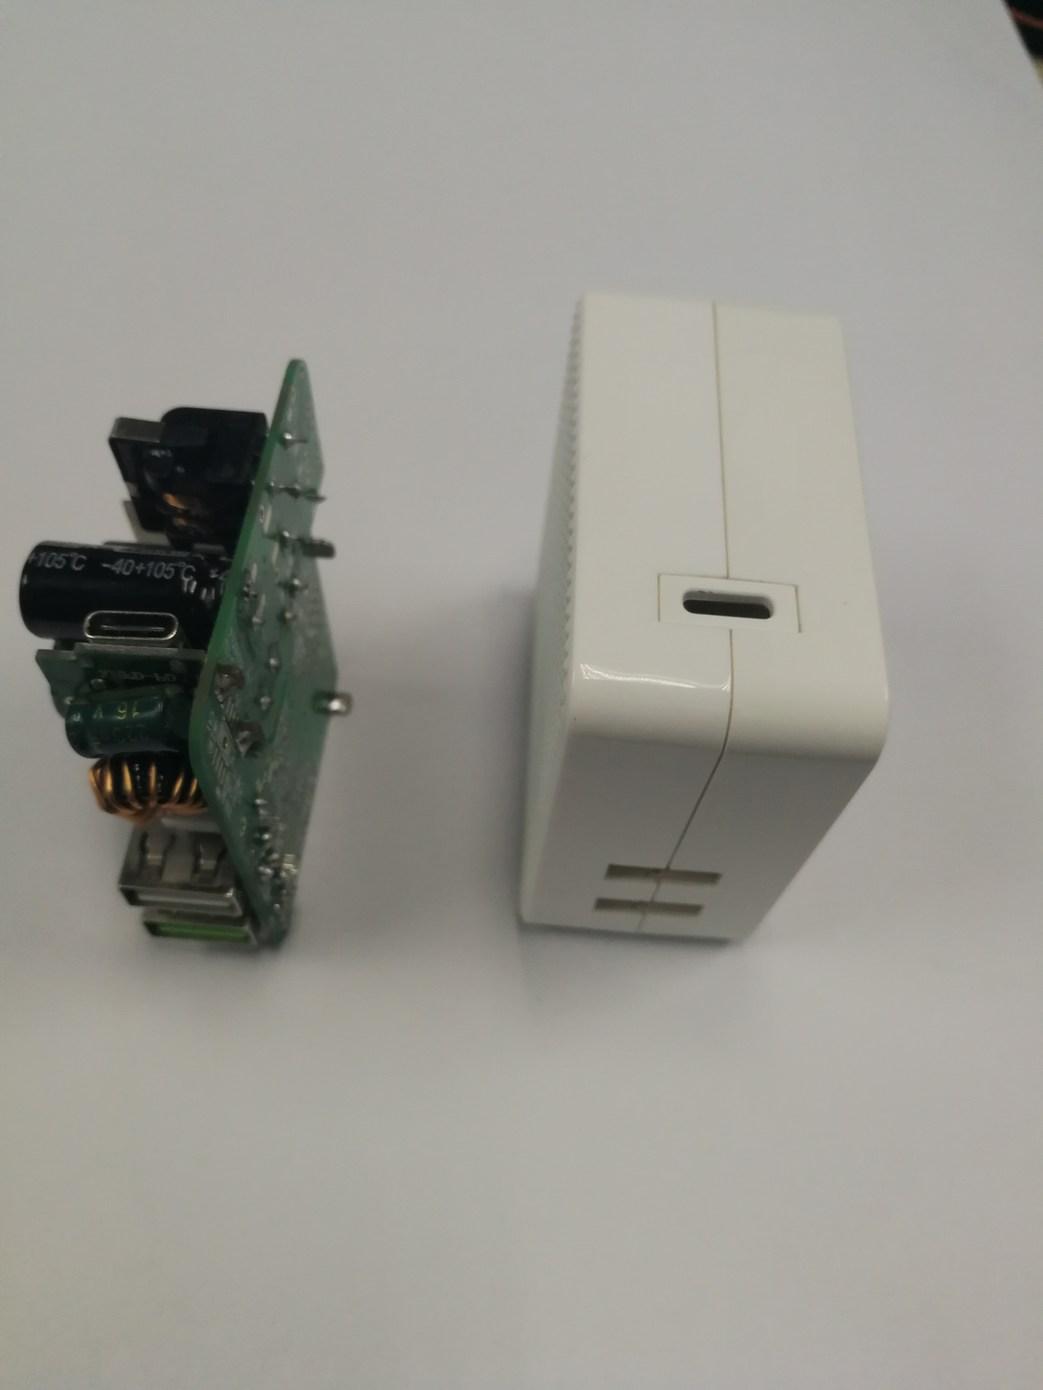 QC 3.0 fast charging + PD Type C